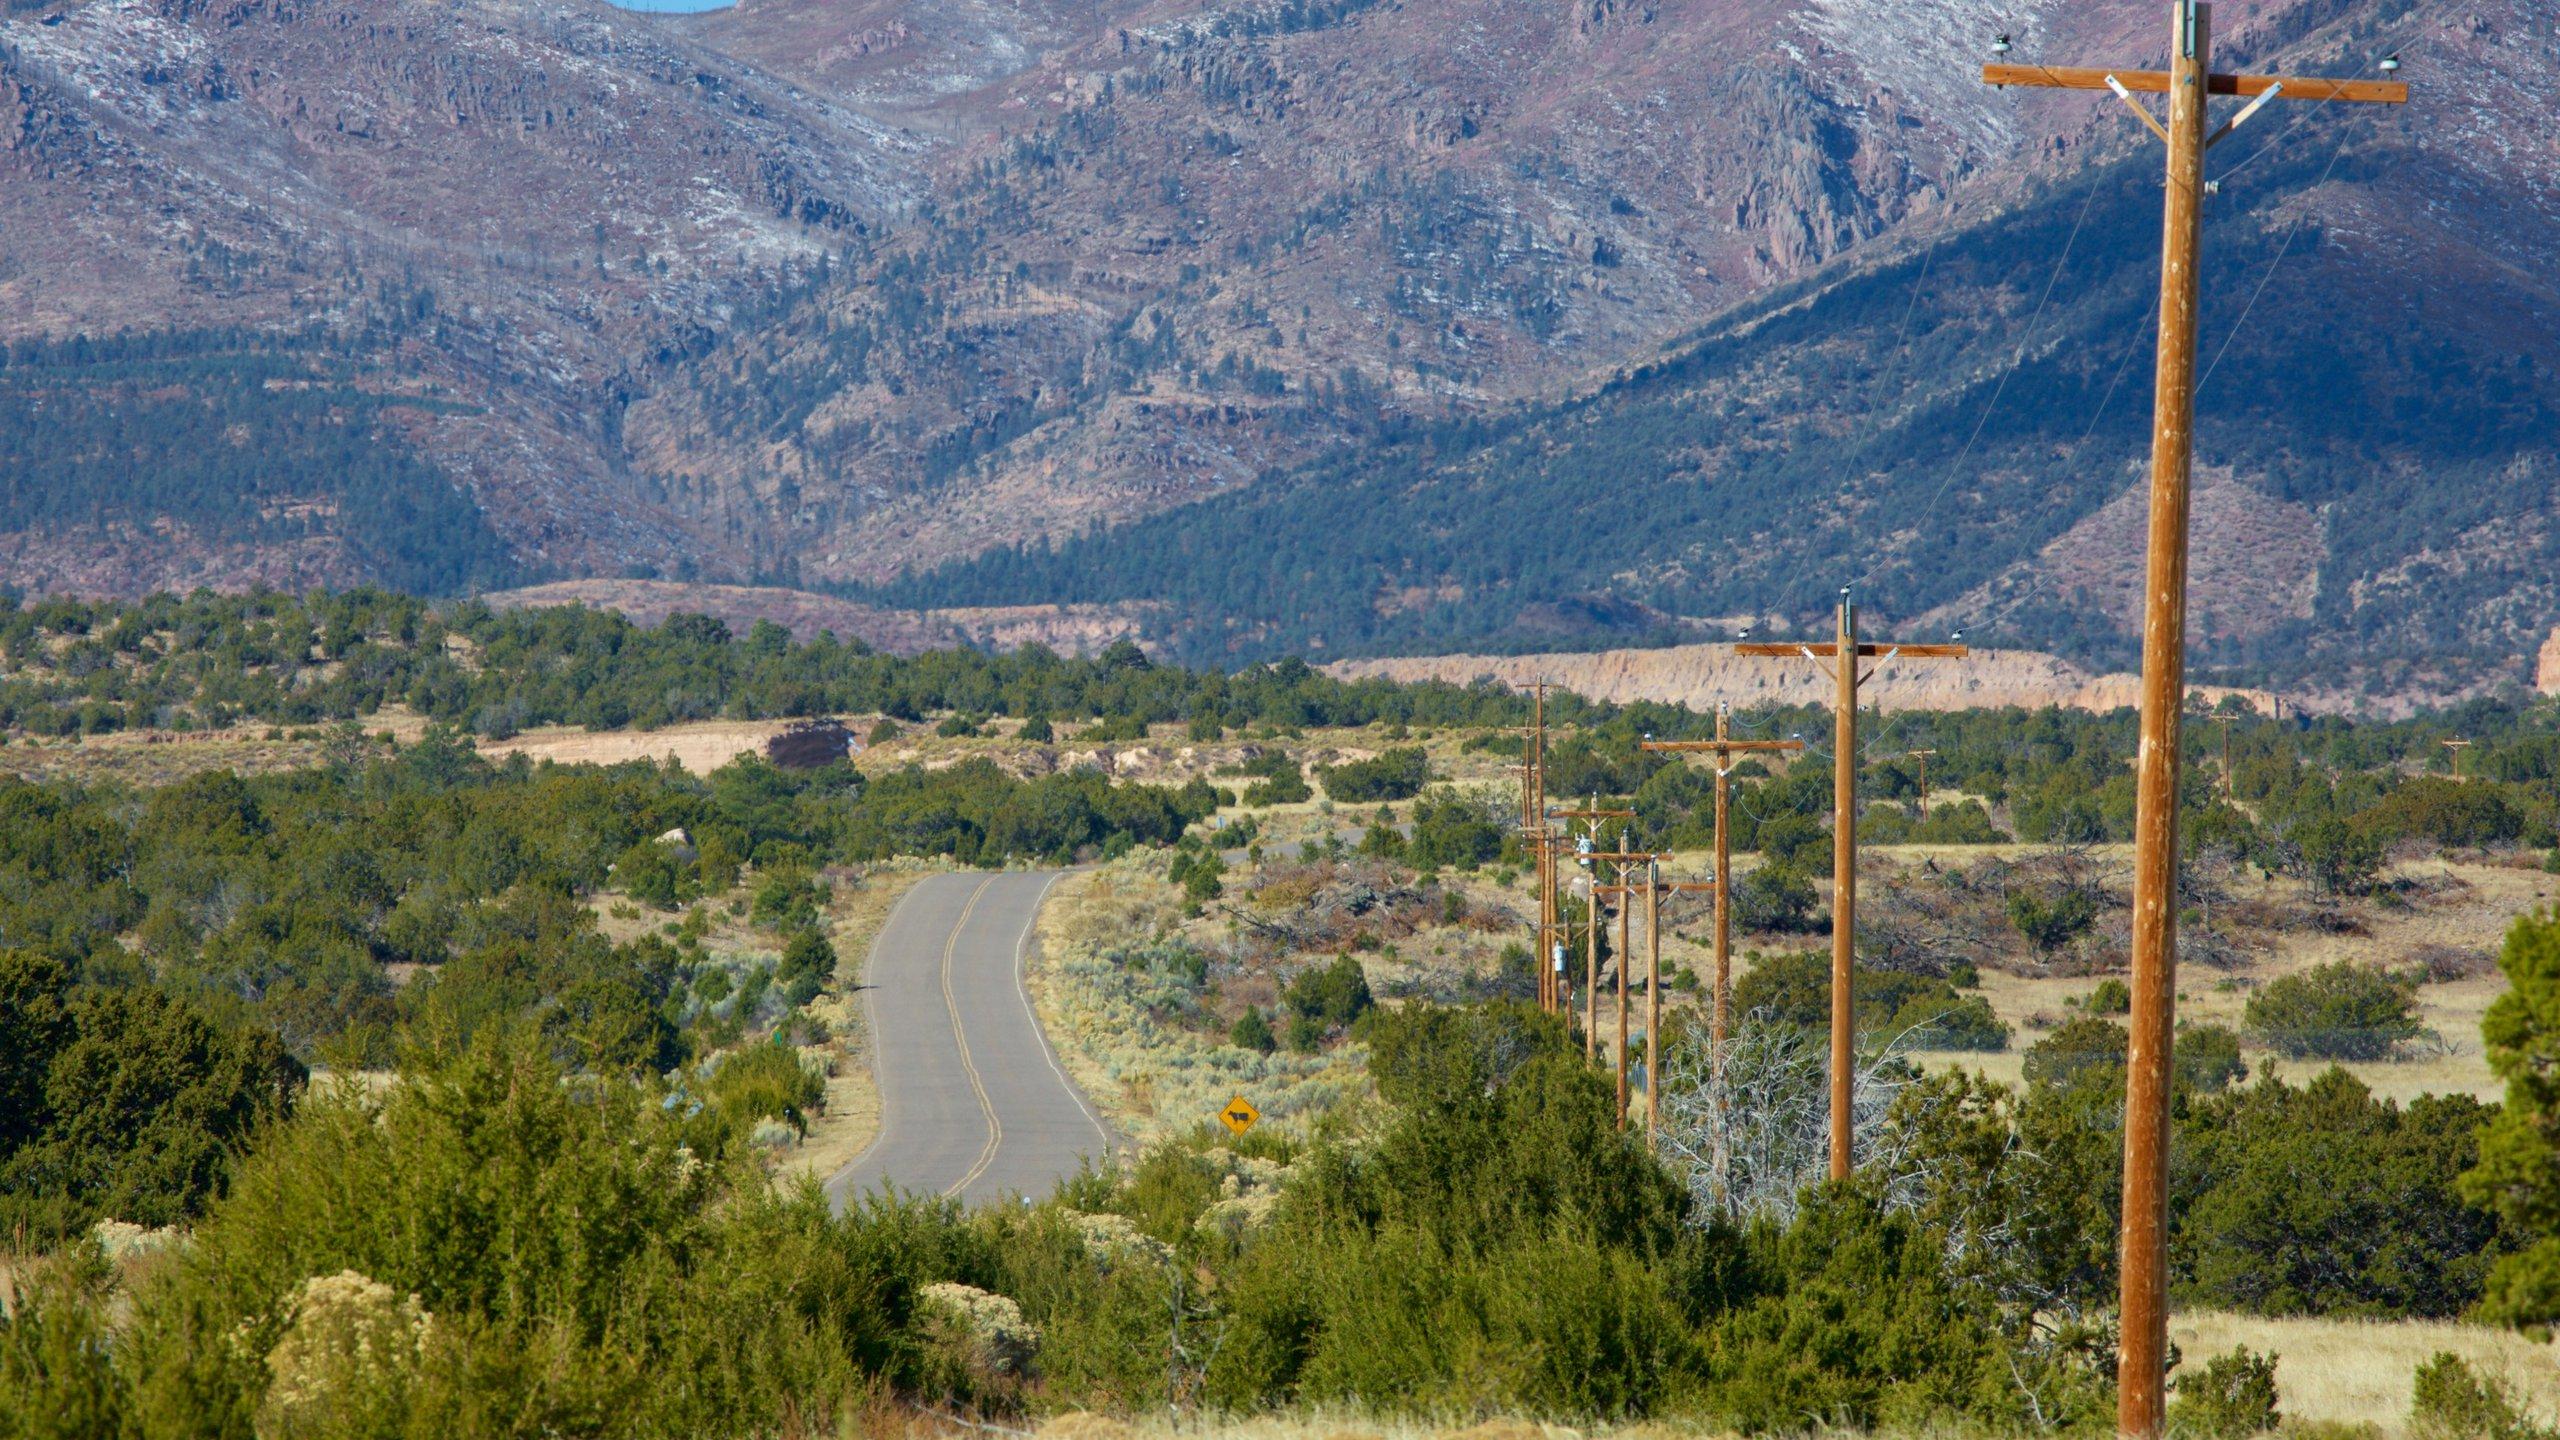 Espanola, New Mexico, United States of America